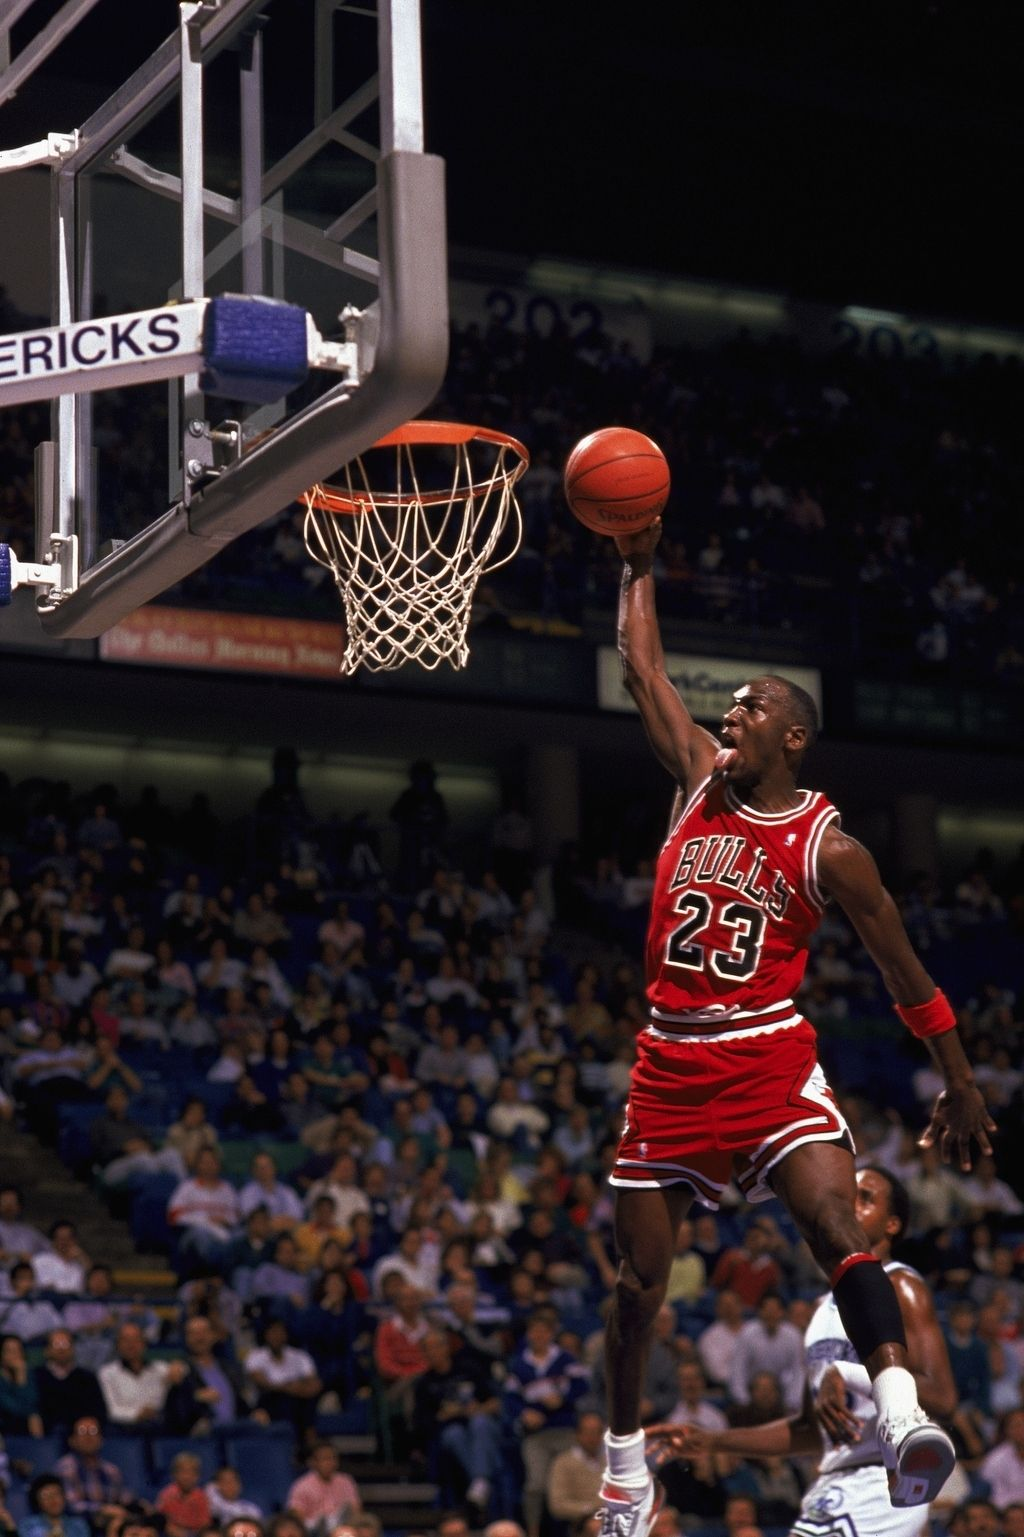 We're number one in Michael Jordans. Michael jordan